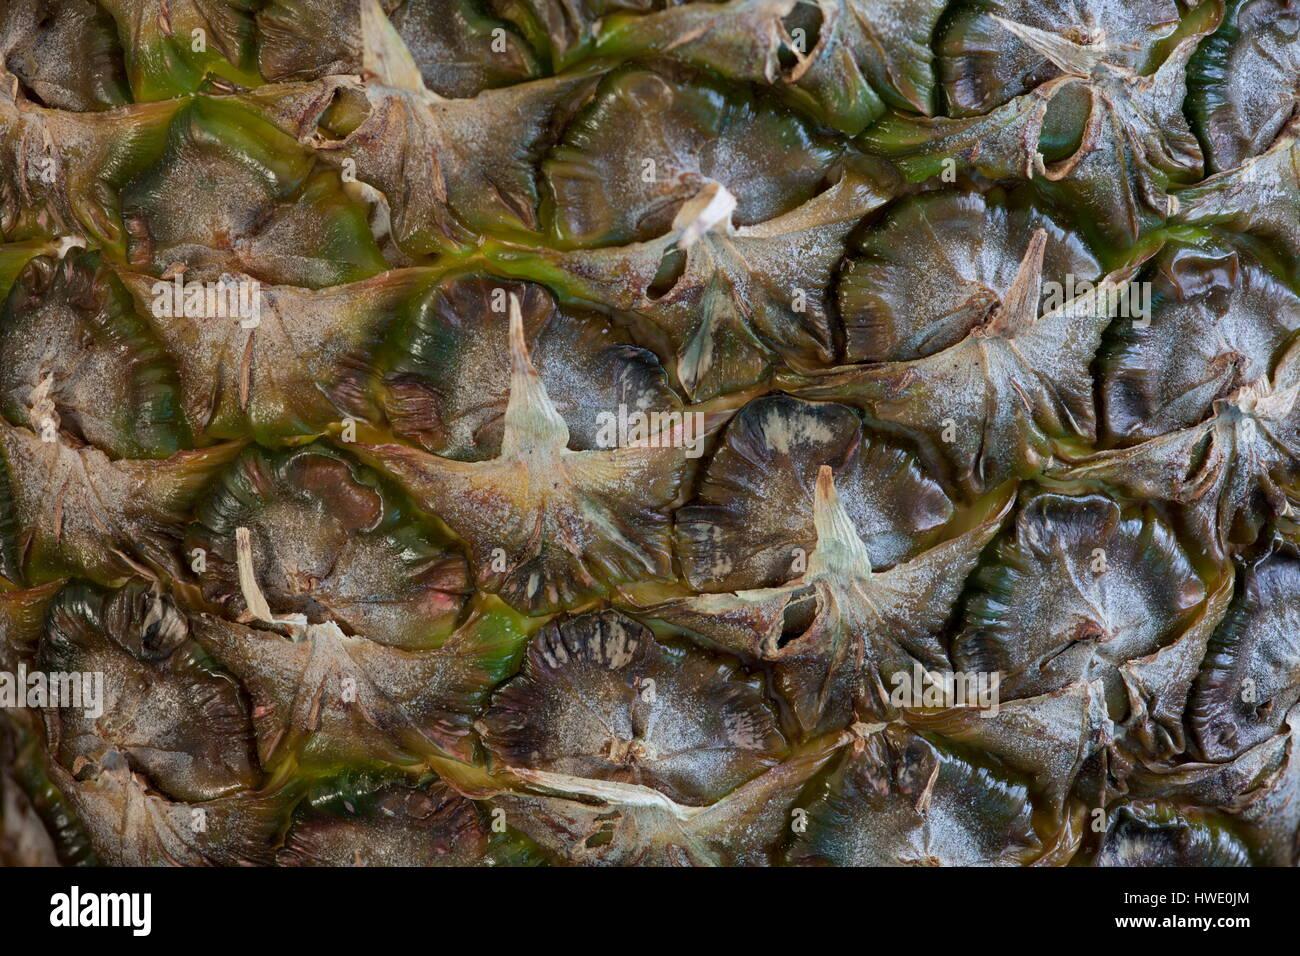 Scaly peel  pineapple, rough outside delicious sweet inside macro - Stock Image